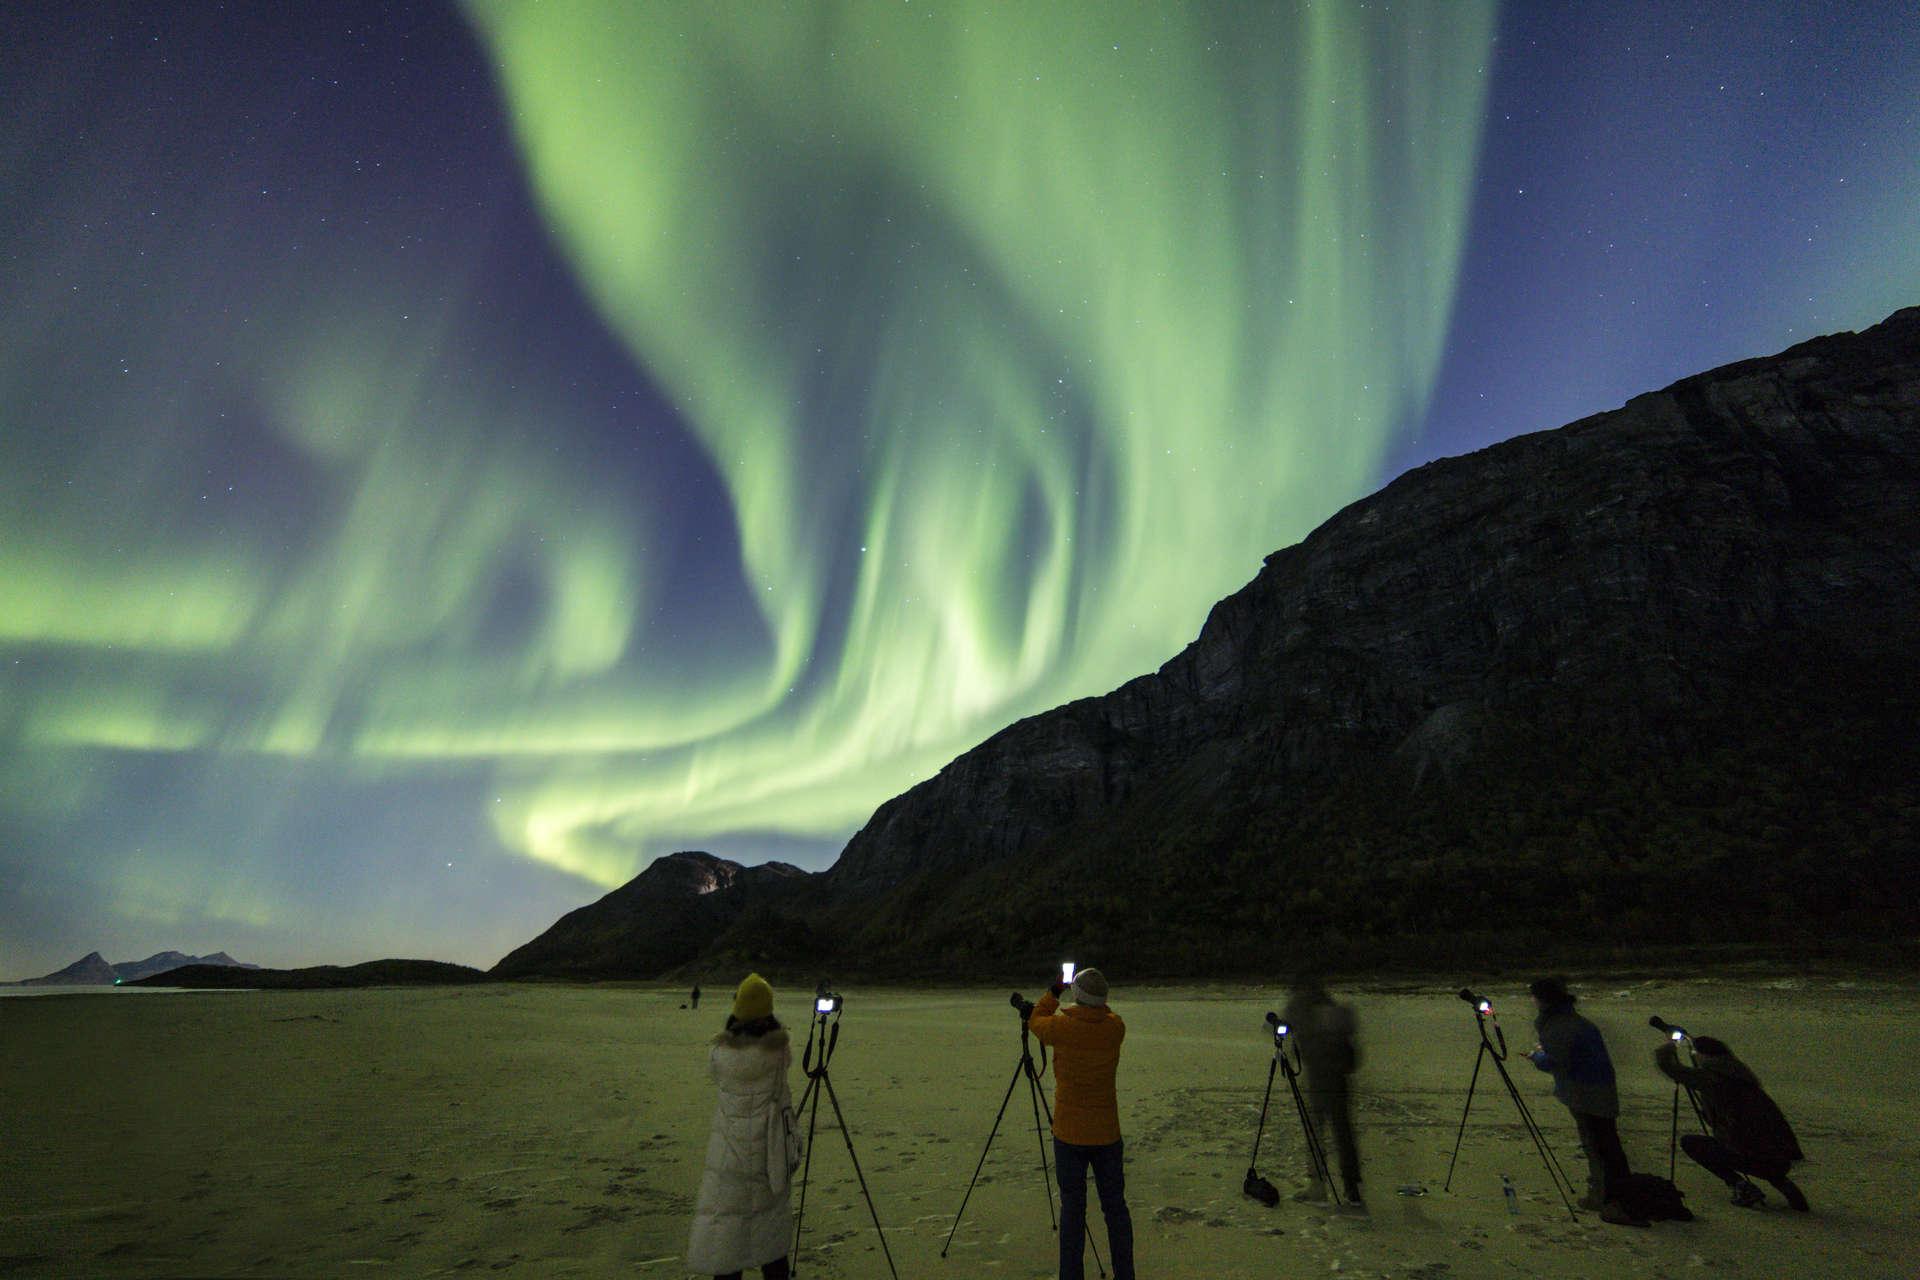 Aurora in Gildeskål south of Bodø © Petter Formo